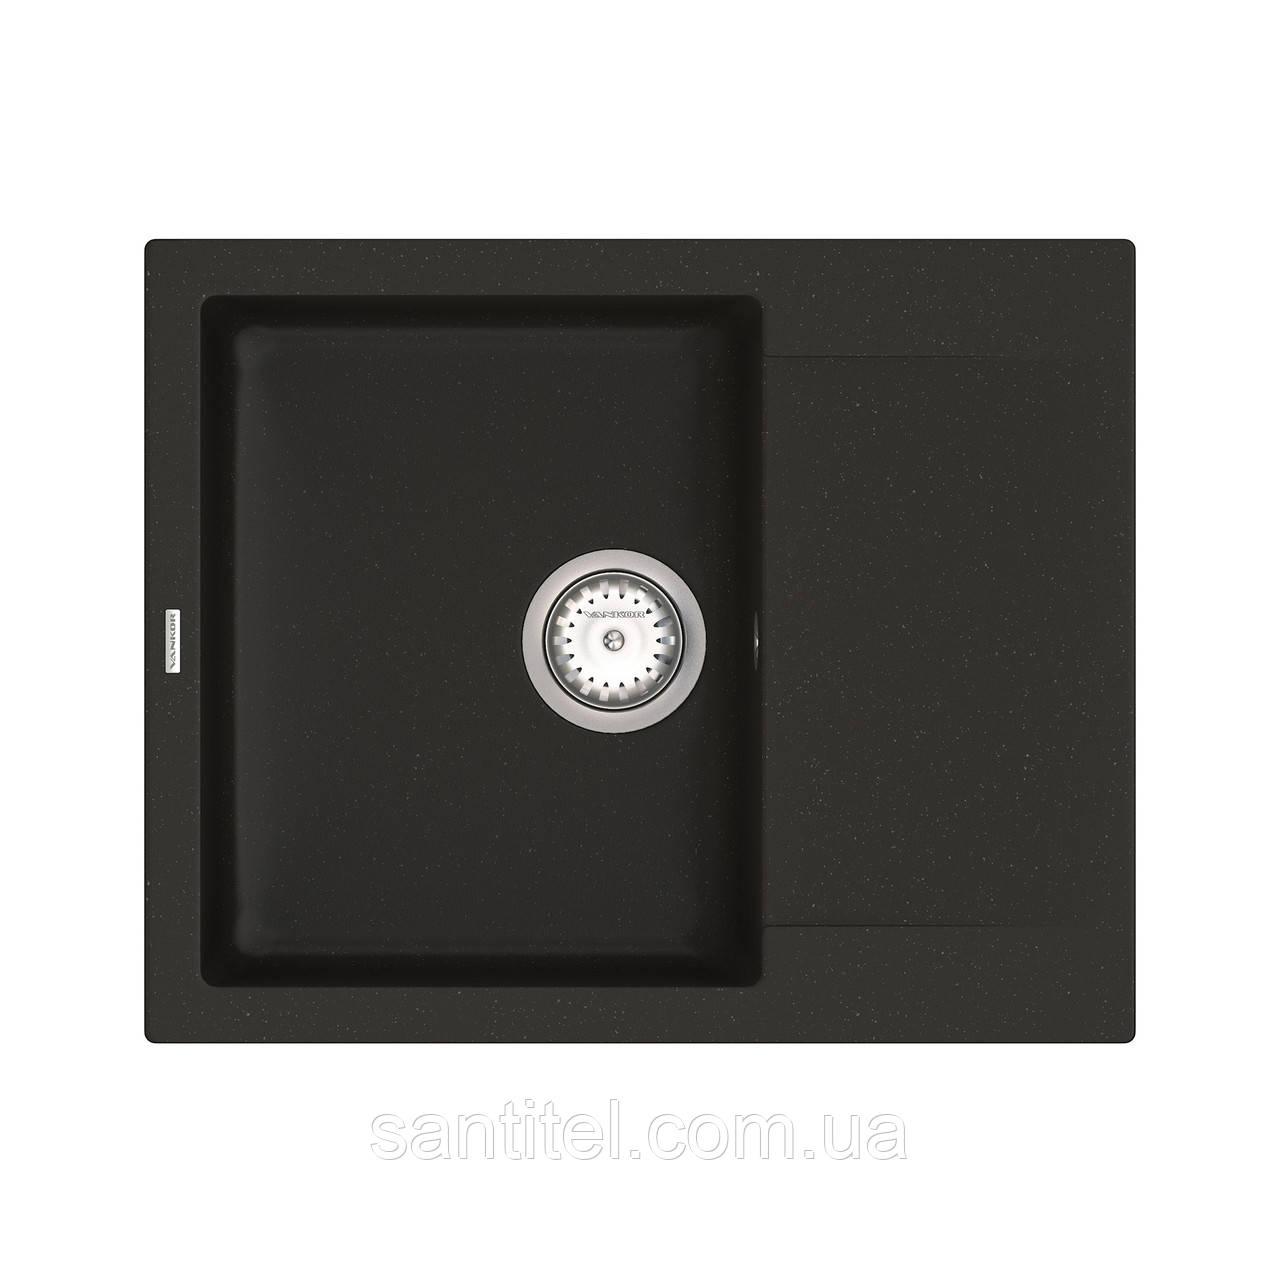 Кухонная мойка VANKOR Orman OMP 02.61 Black + сифон VANKOR